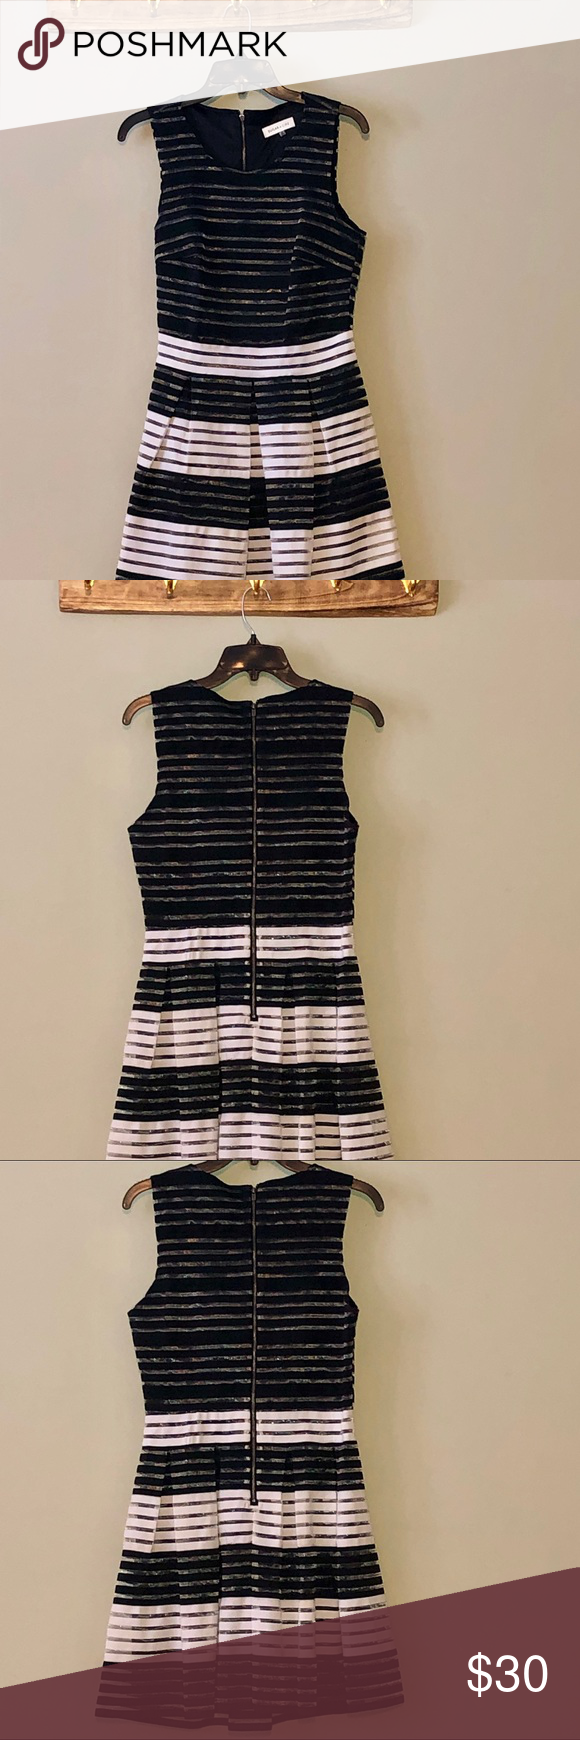 30++ Dillards black and white dress information